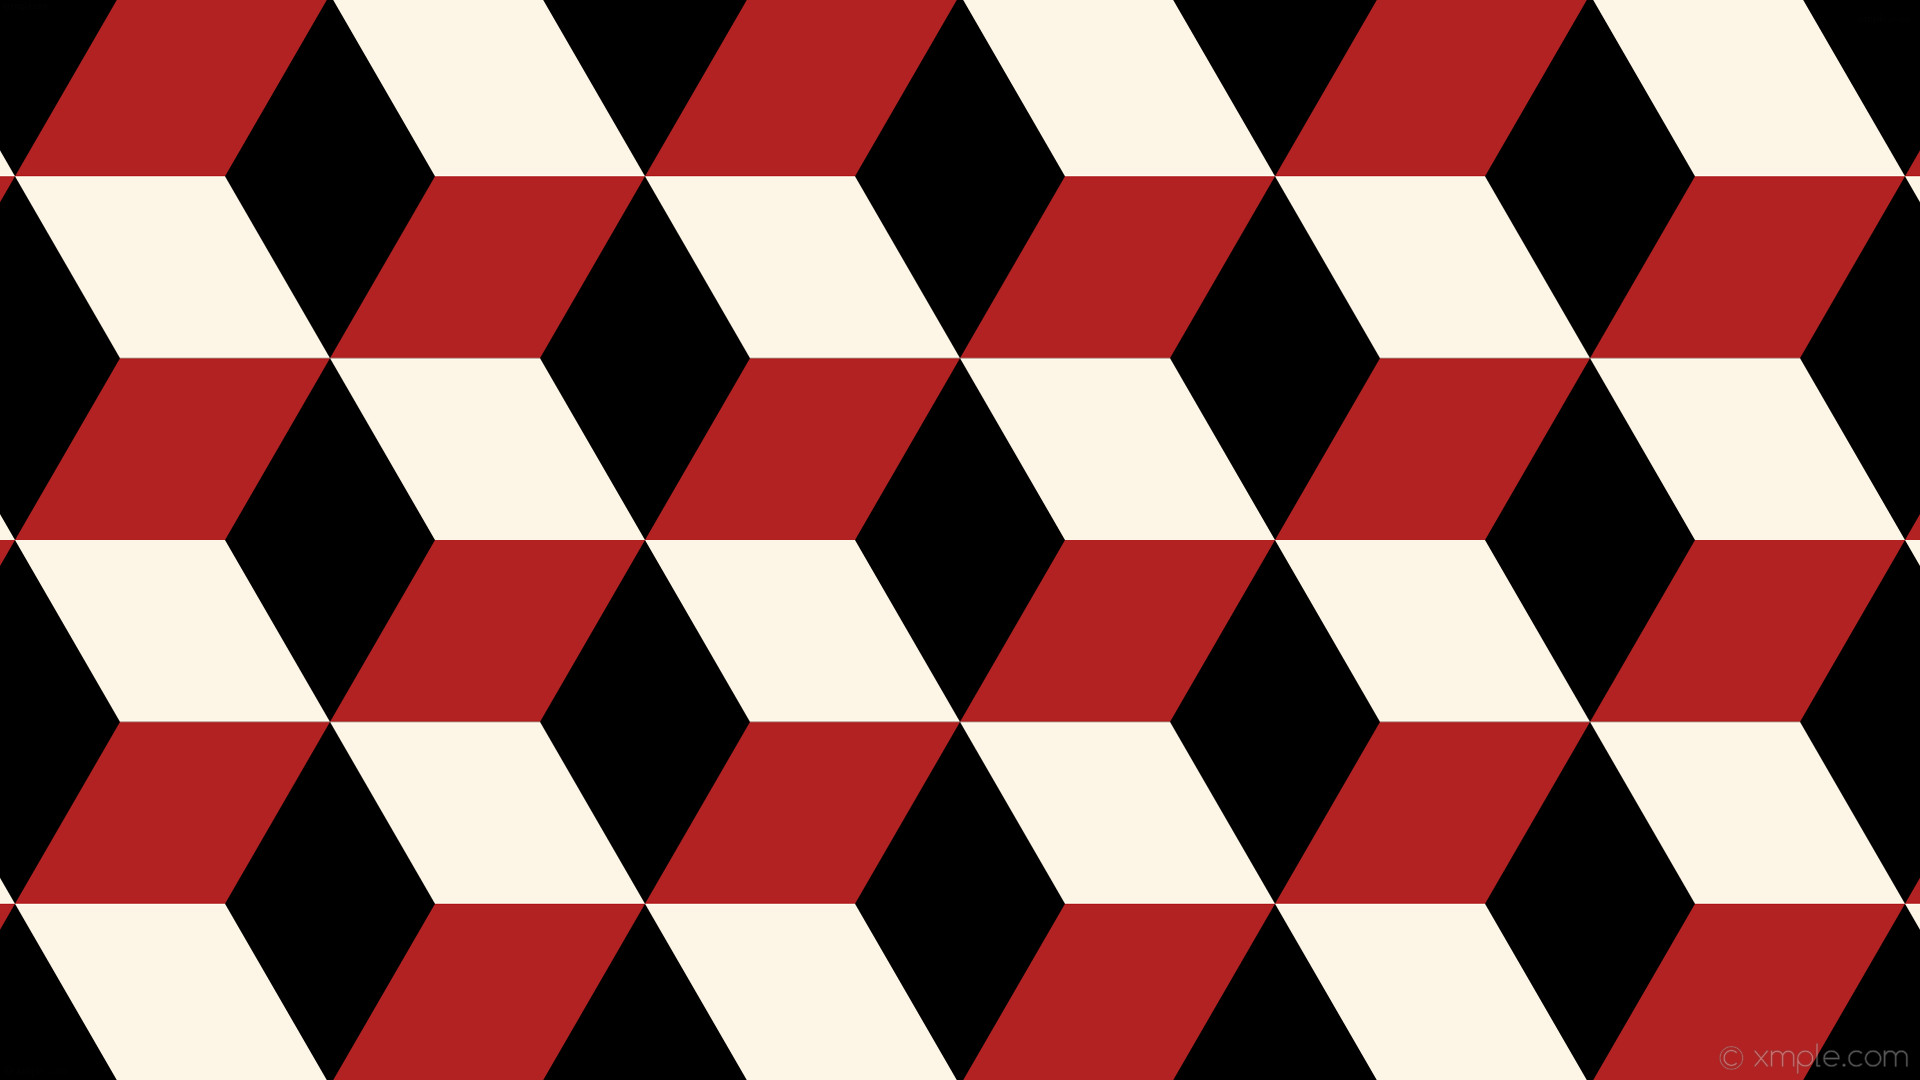 wallpaper red 3d cubes white black fire brick old lace #000000 #b22222  #fdf5e6